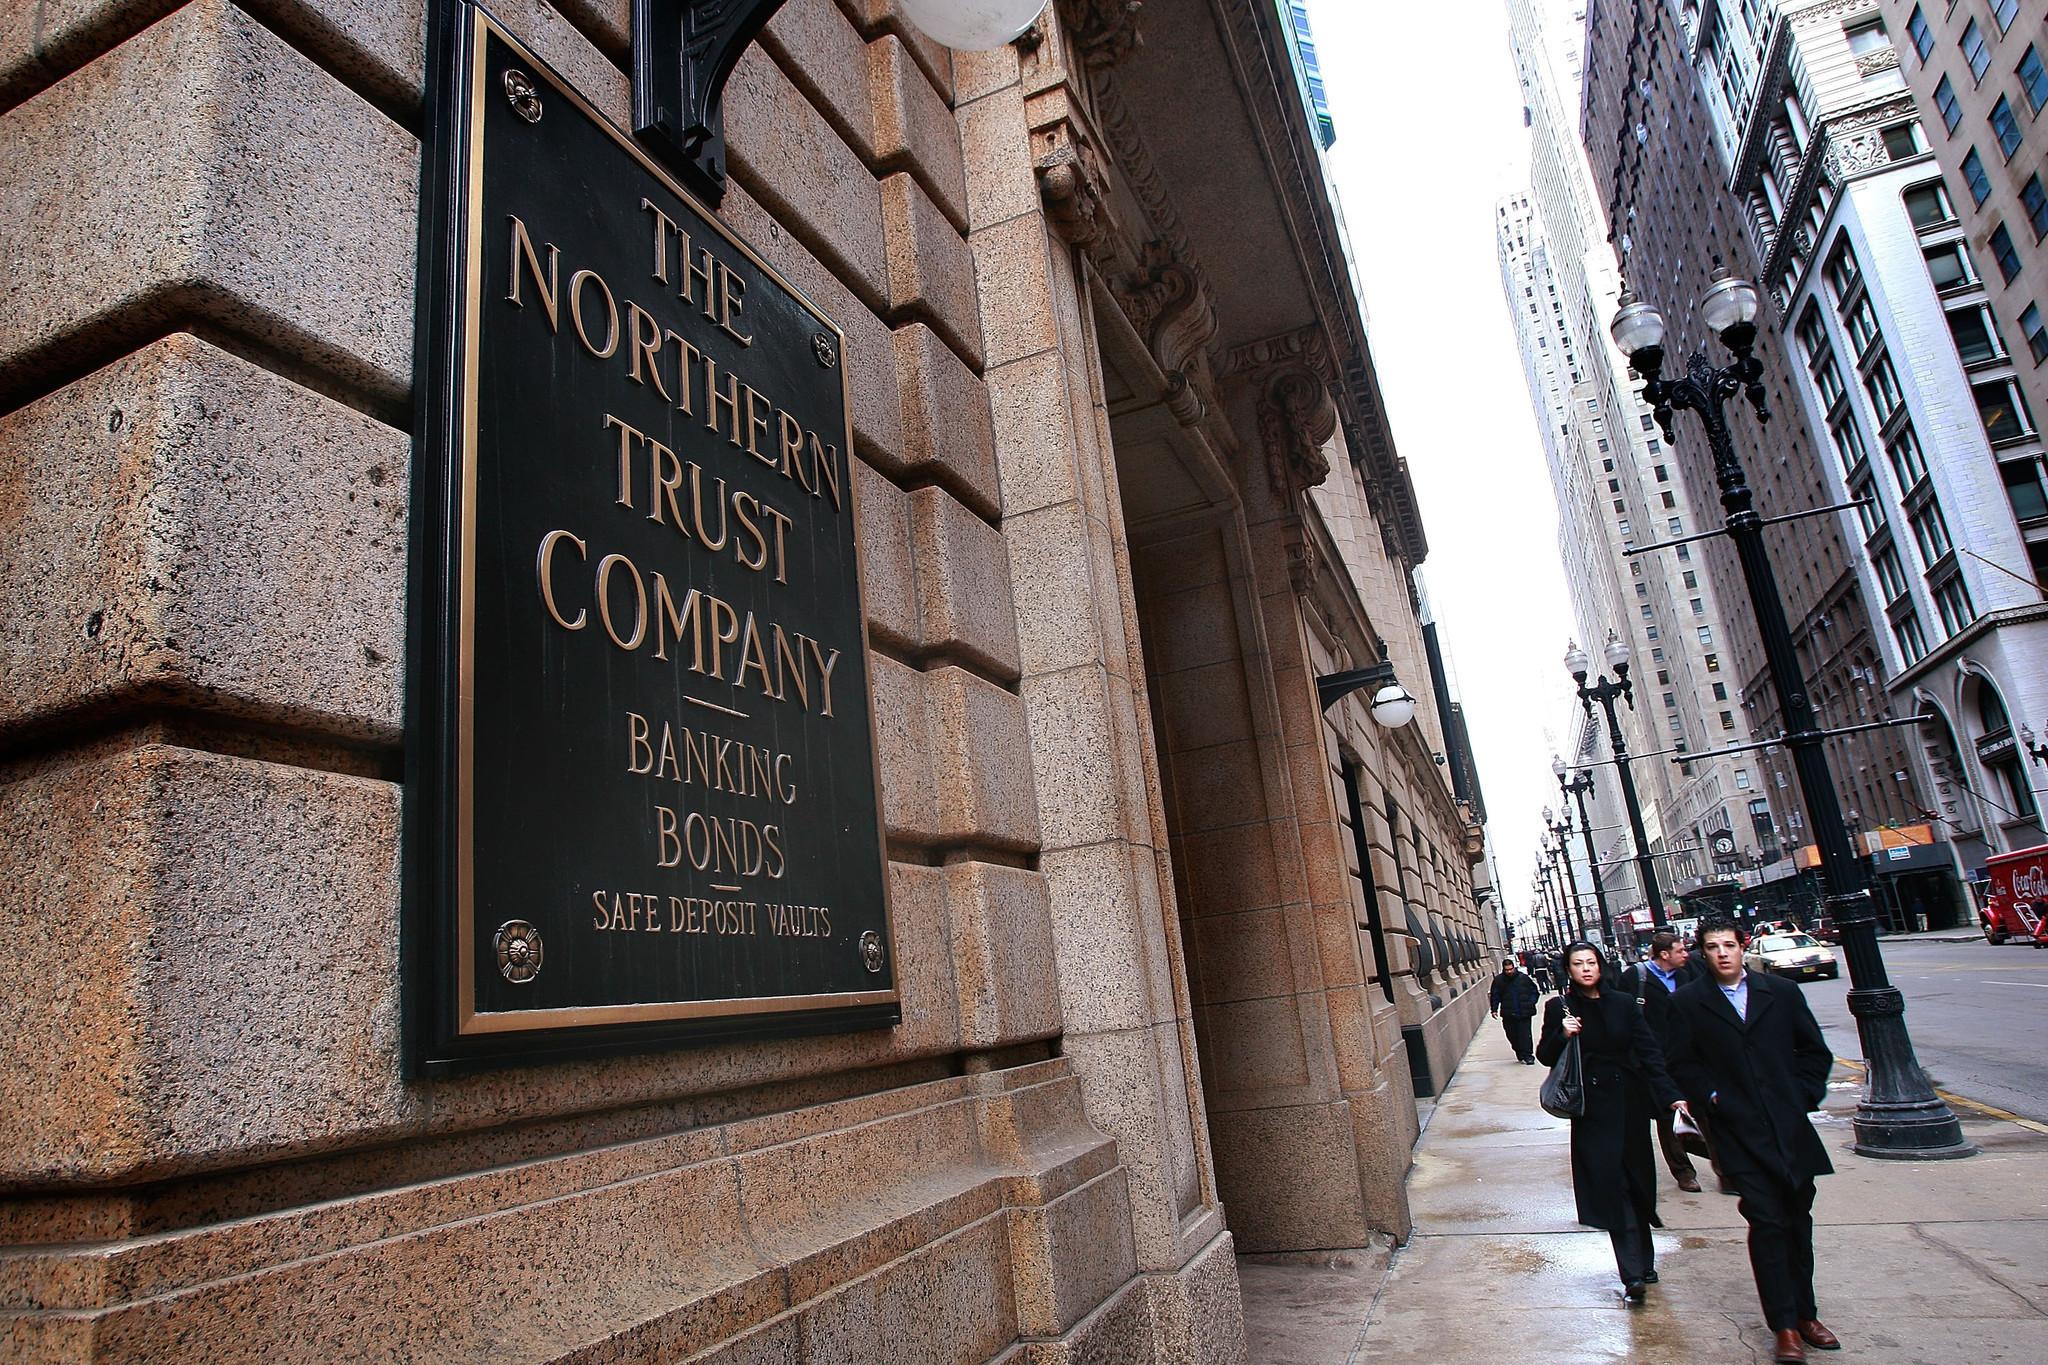 Overseas tax strategy helps Northern Trust boost earnings ...